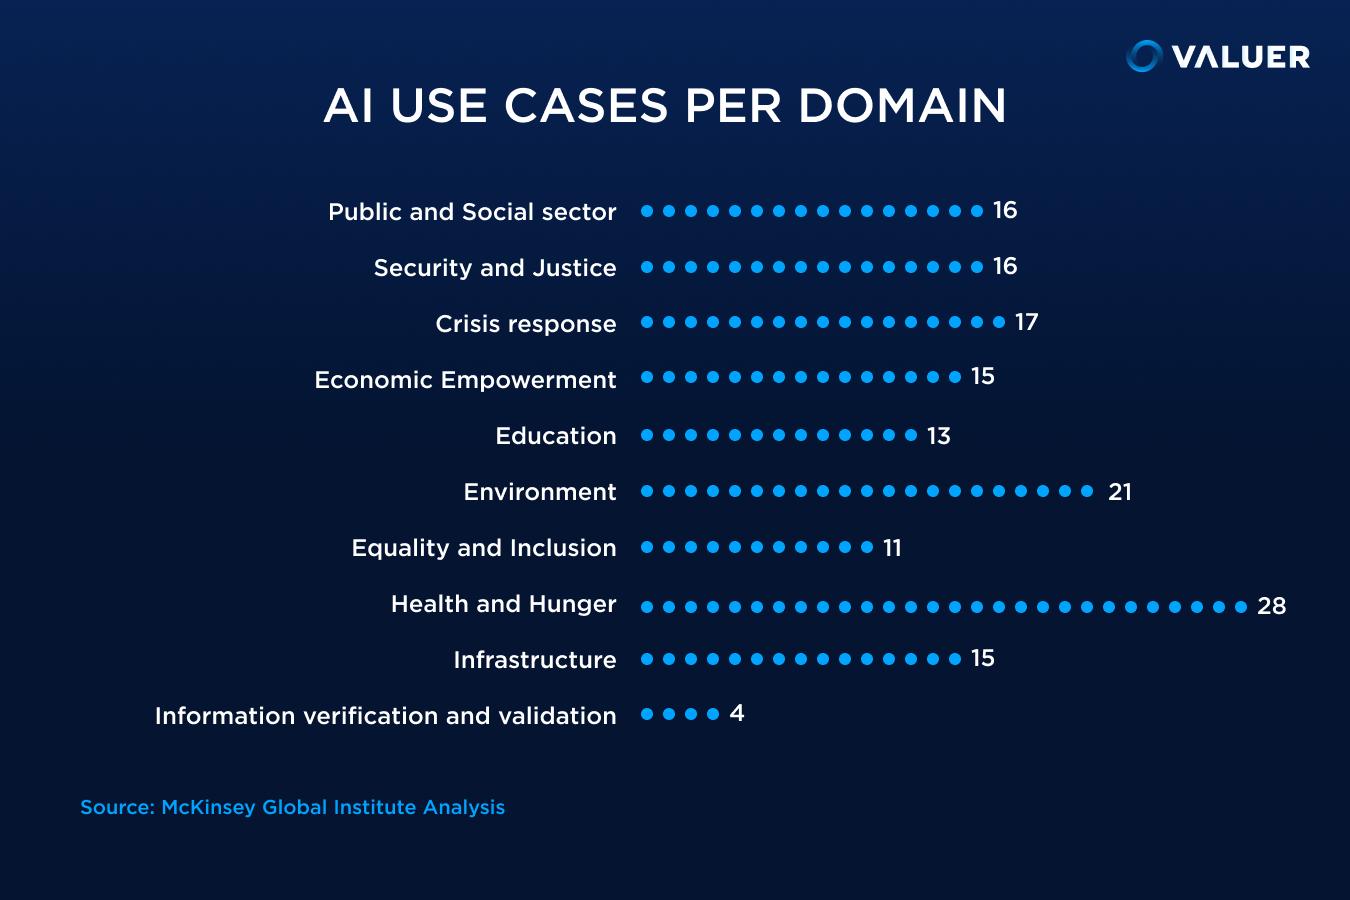 AI use cases per domain